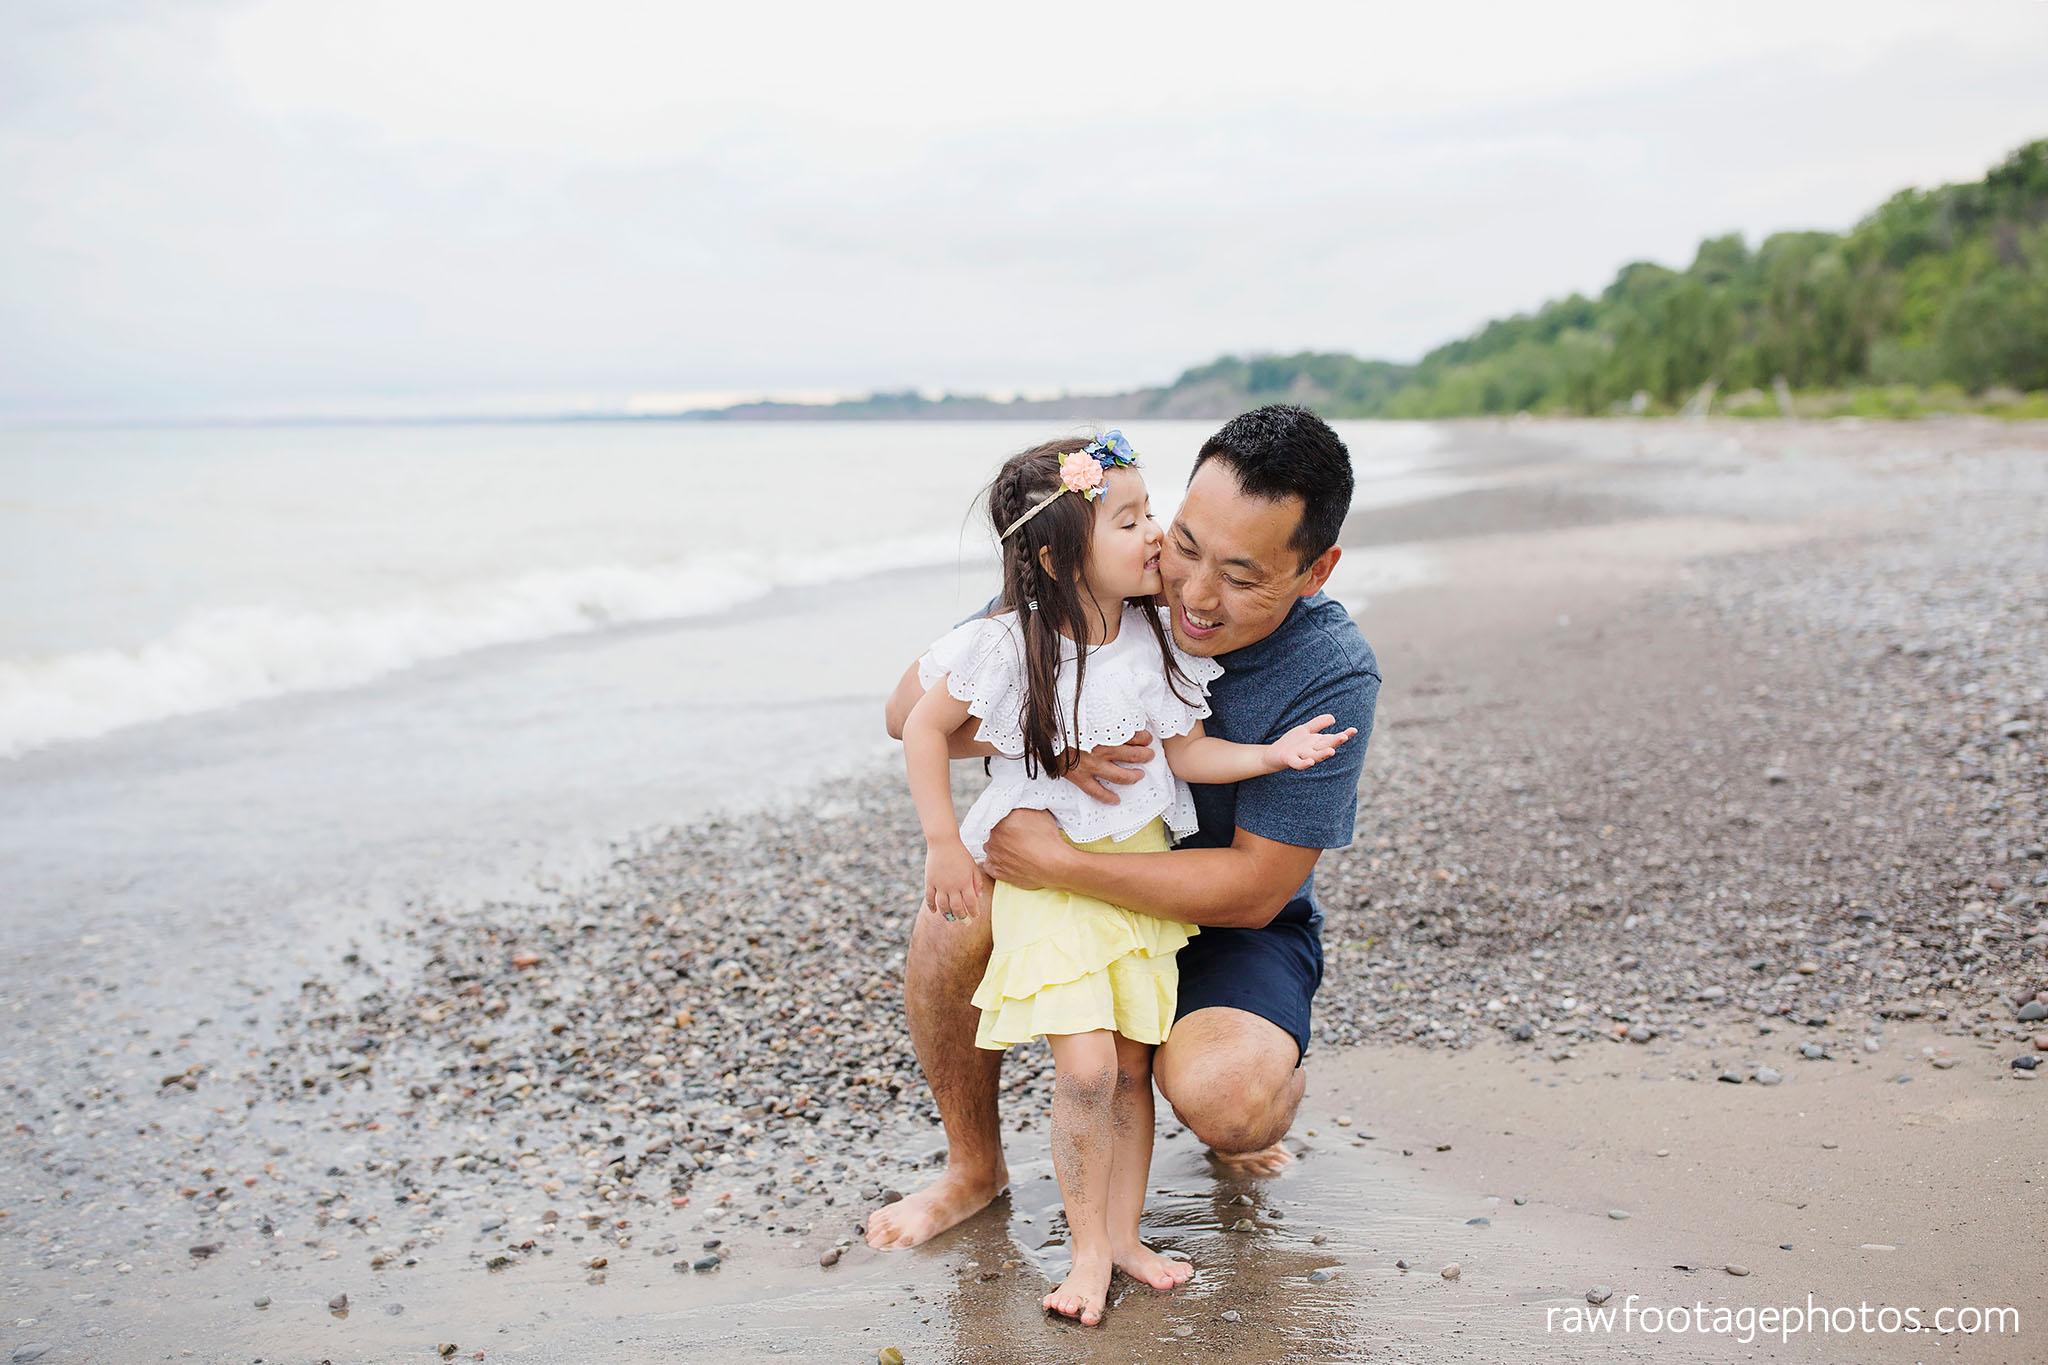 london_ontario_photographer-raw_footage_photography-beach_minis-port_stanley_beach-family_photographer-couple_photographer-lifestyle_photographer006.jpg